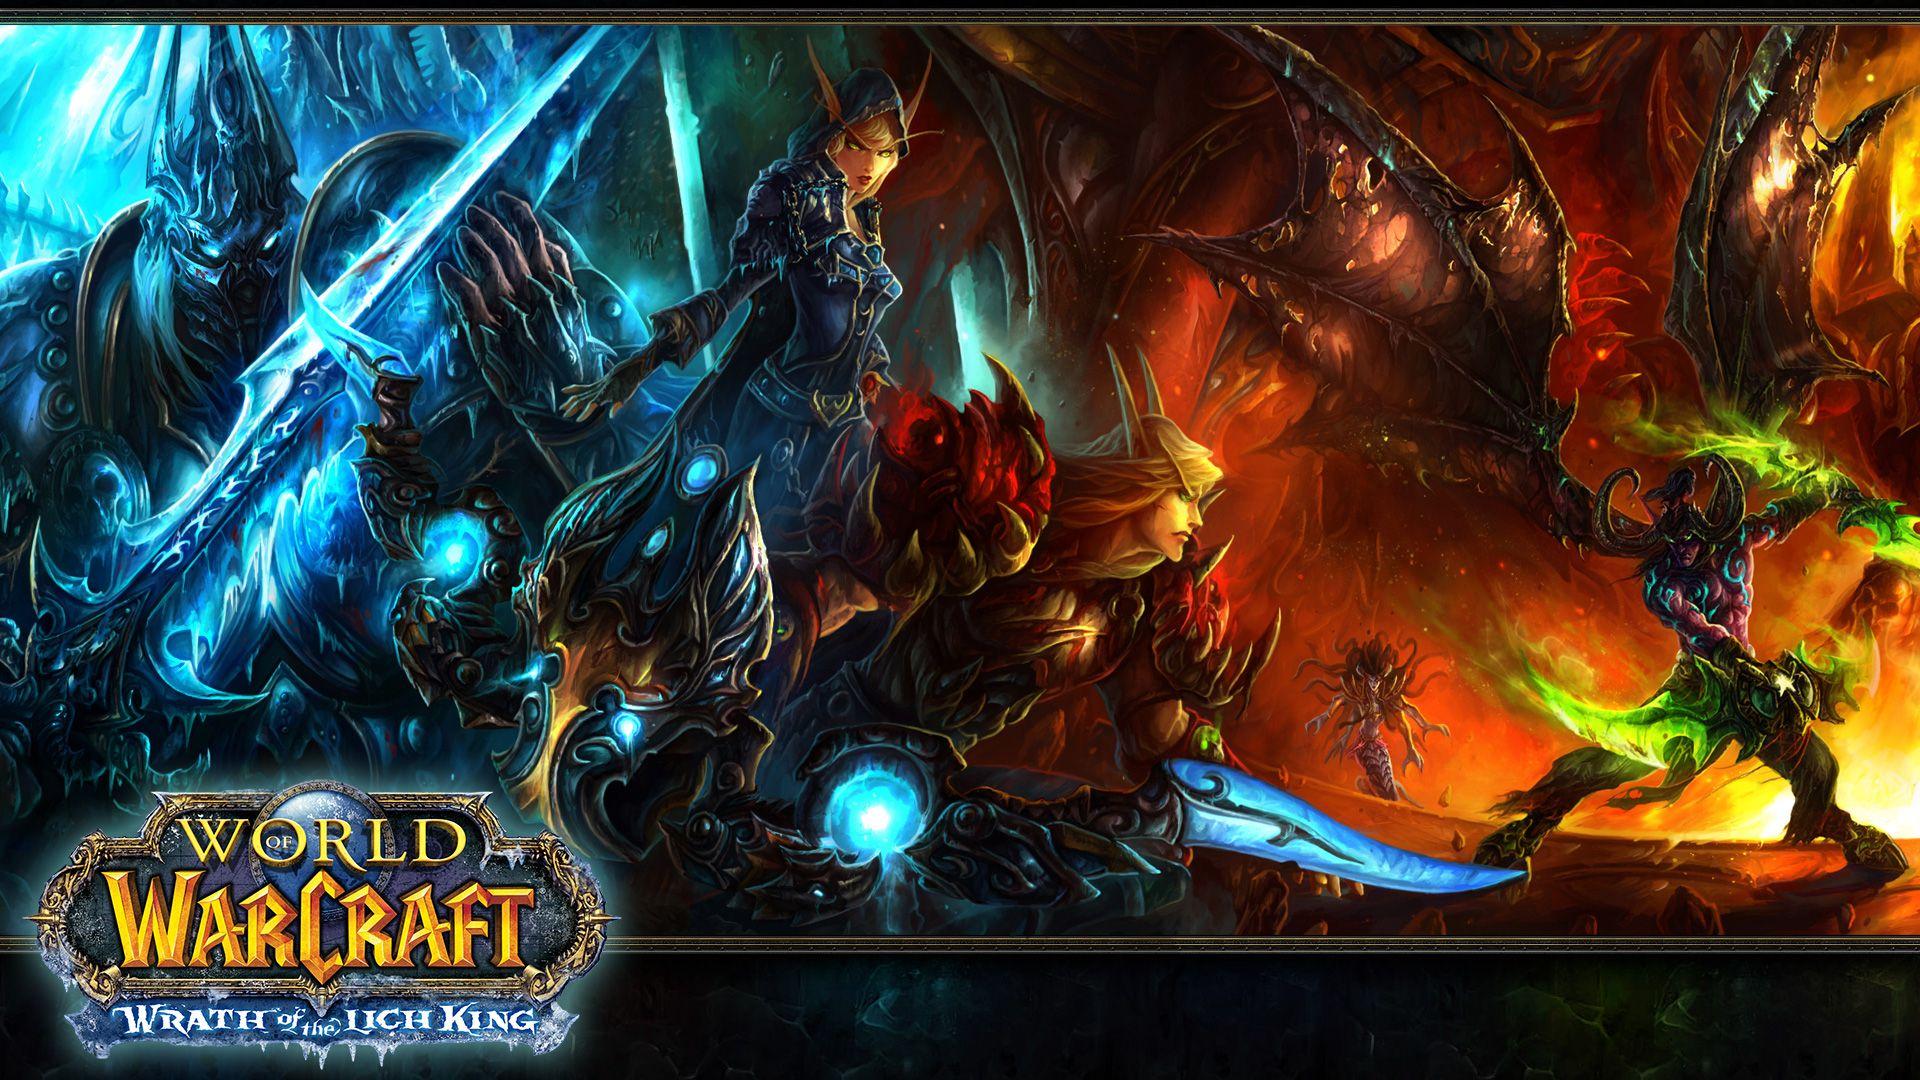 World Of Warcraft Wallpaper World Of Warcraft Wallpaper World